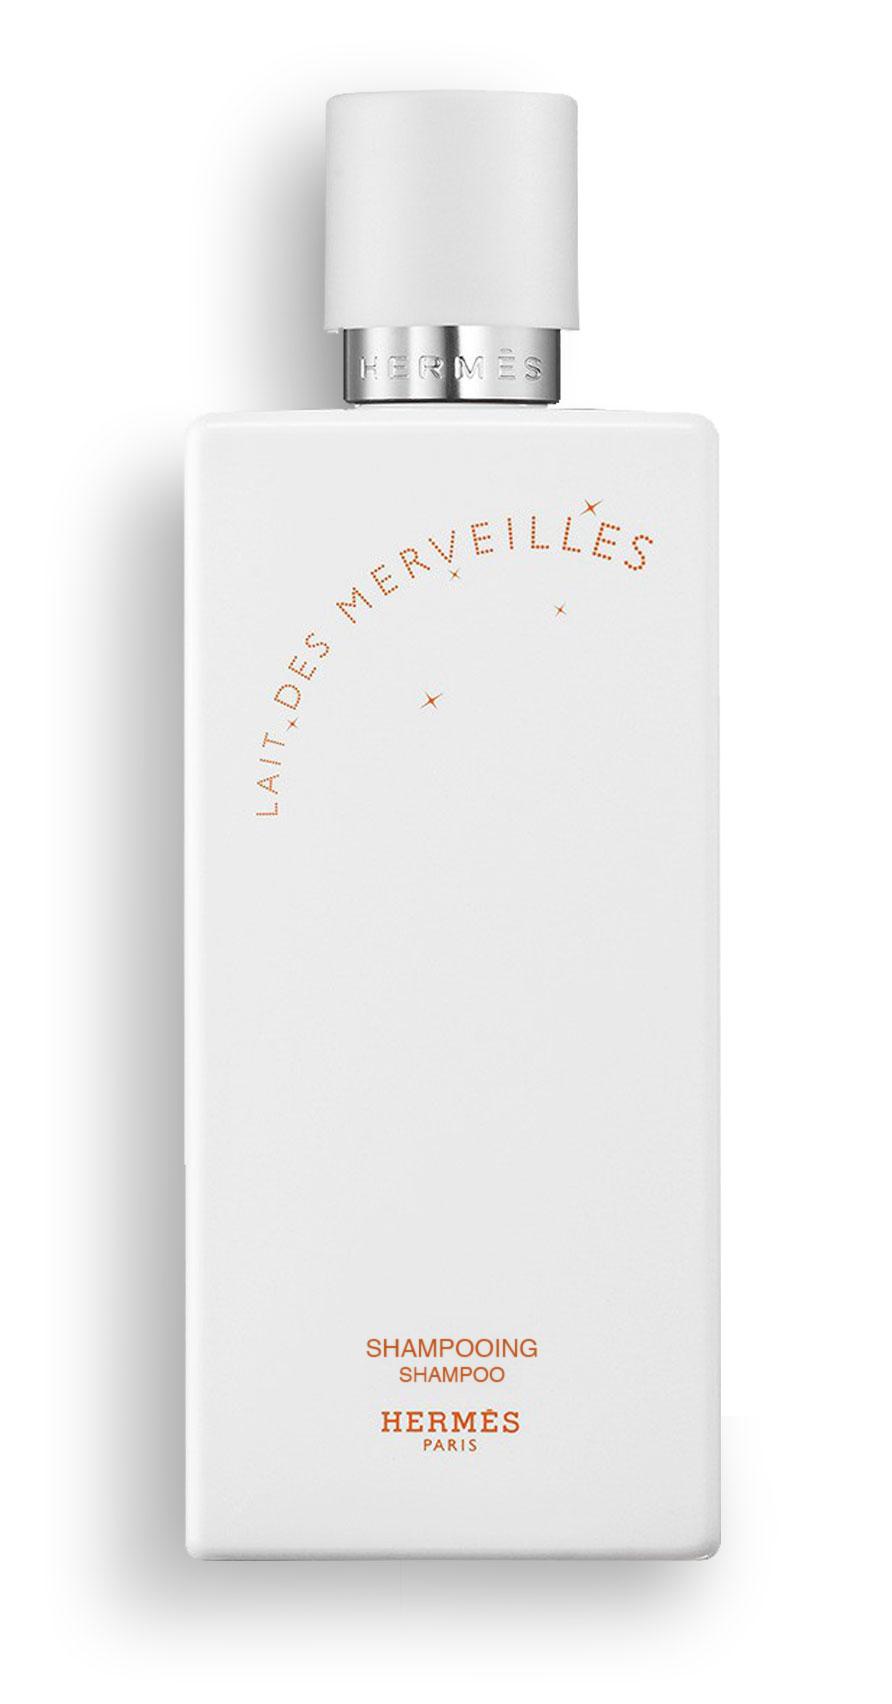 Hermès - Eau des merveilles - Shampooing - 200 ml.